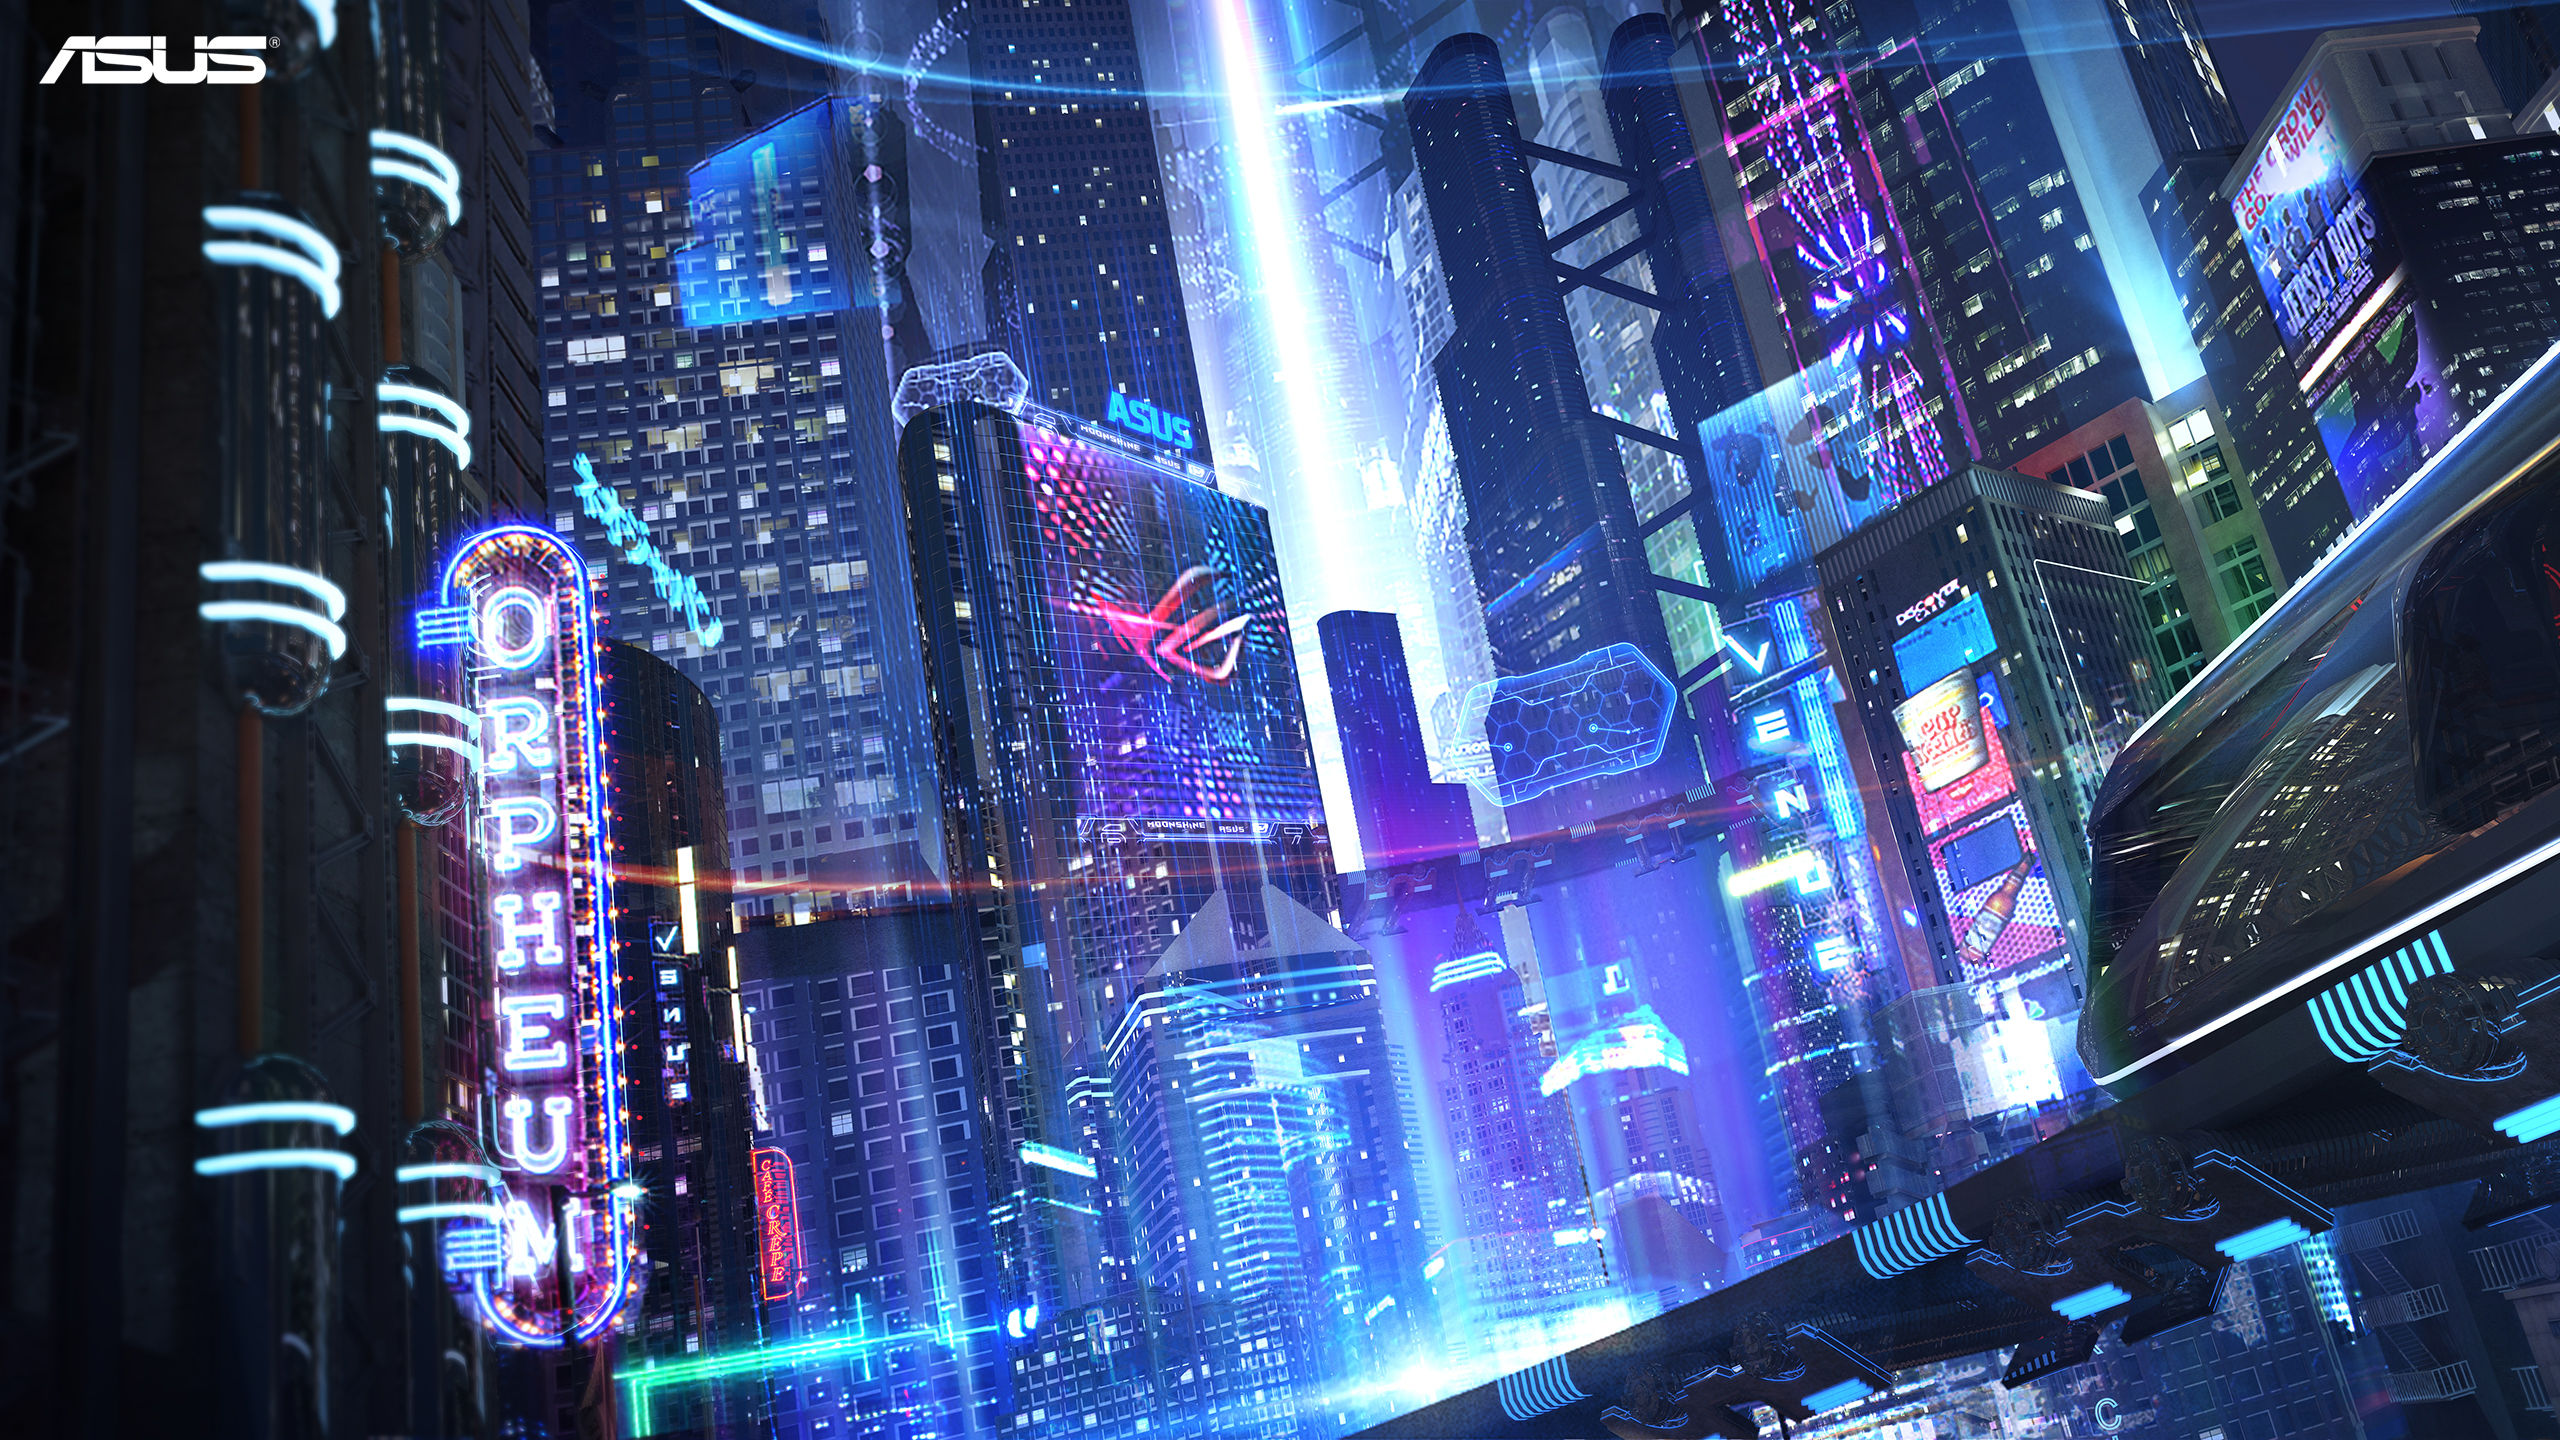 4k Sci Fi City 2560x1440 Download Hd Wallpaper Wallpapertip